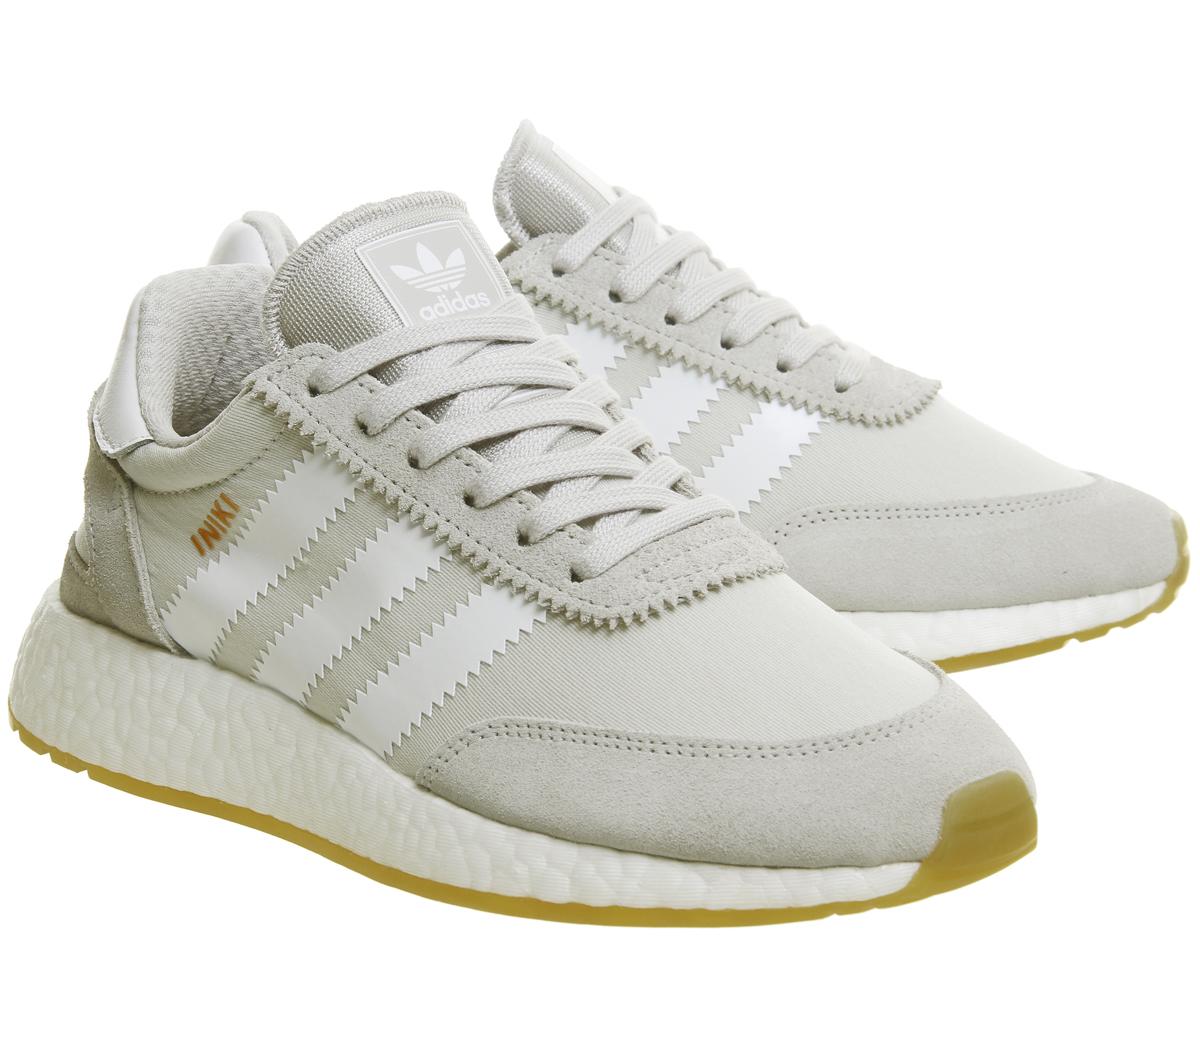 damen adidas iniki runners grau grau one gum sneaker ebay. Black Bedroom Furniture Sets. Home Design Ideas